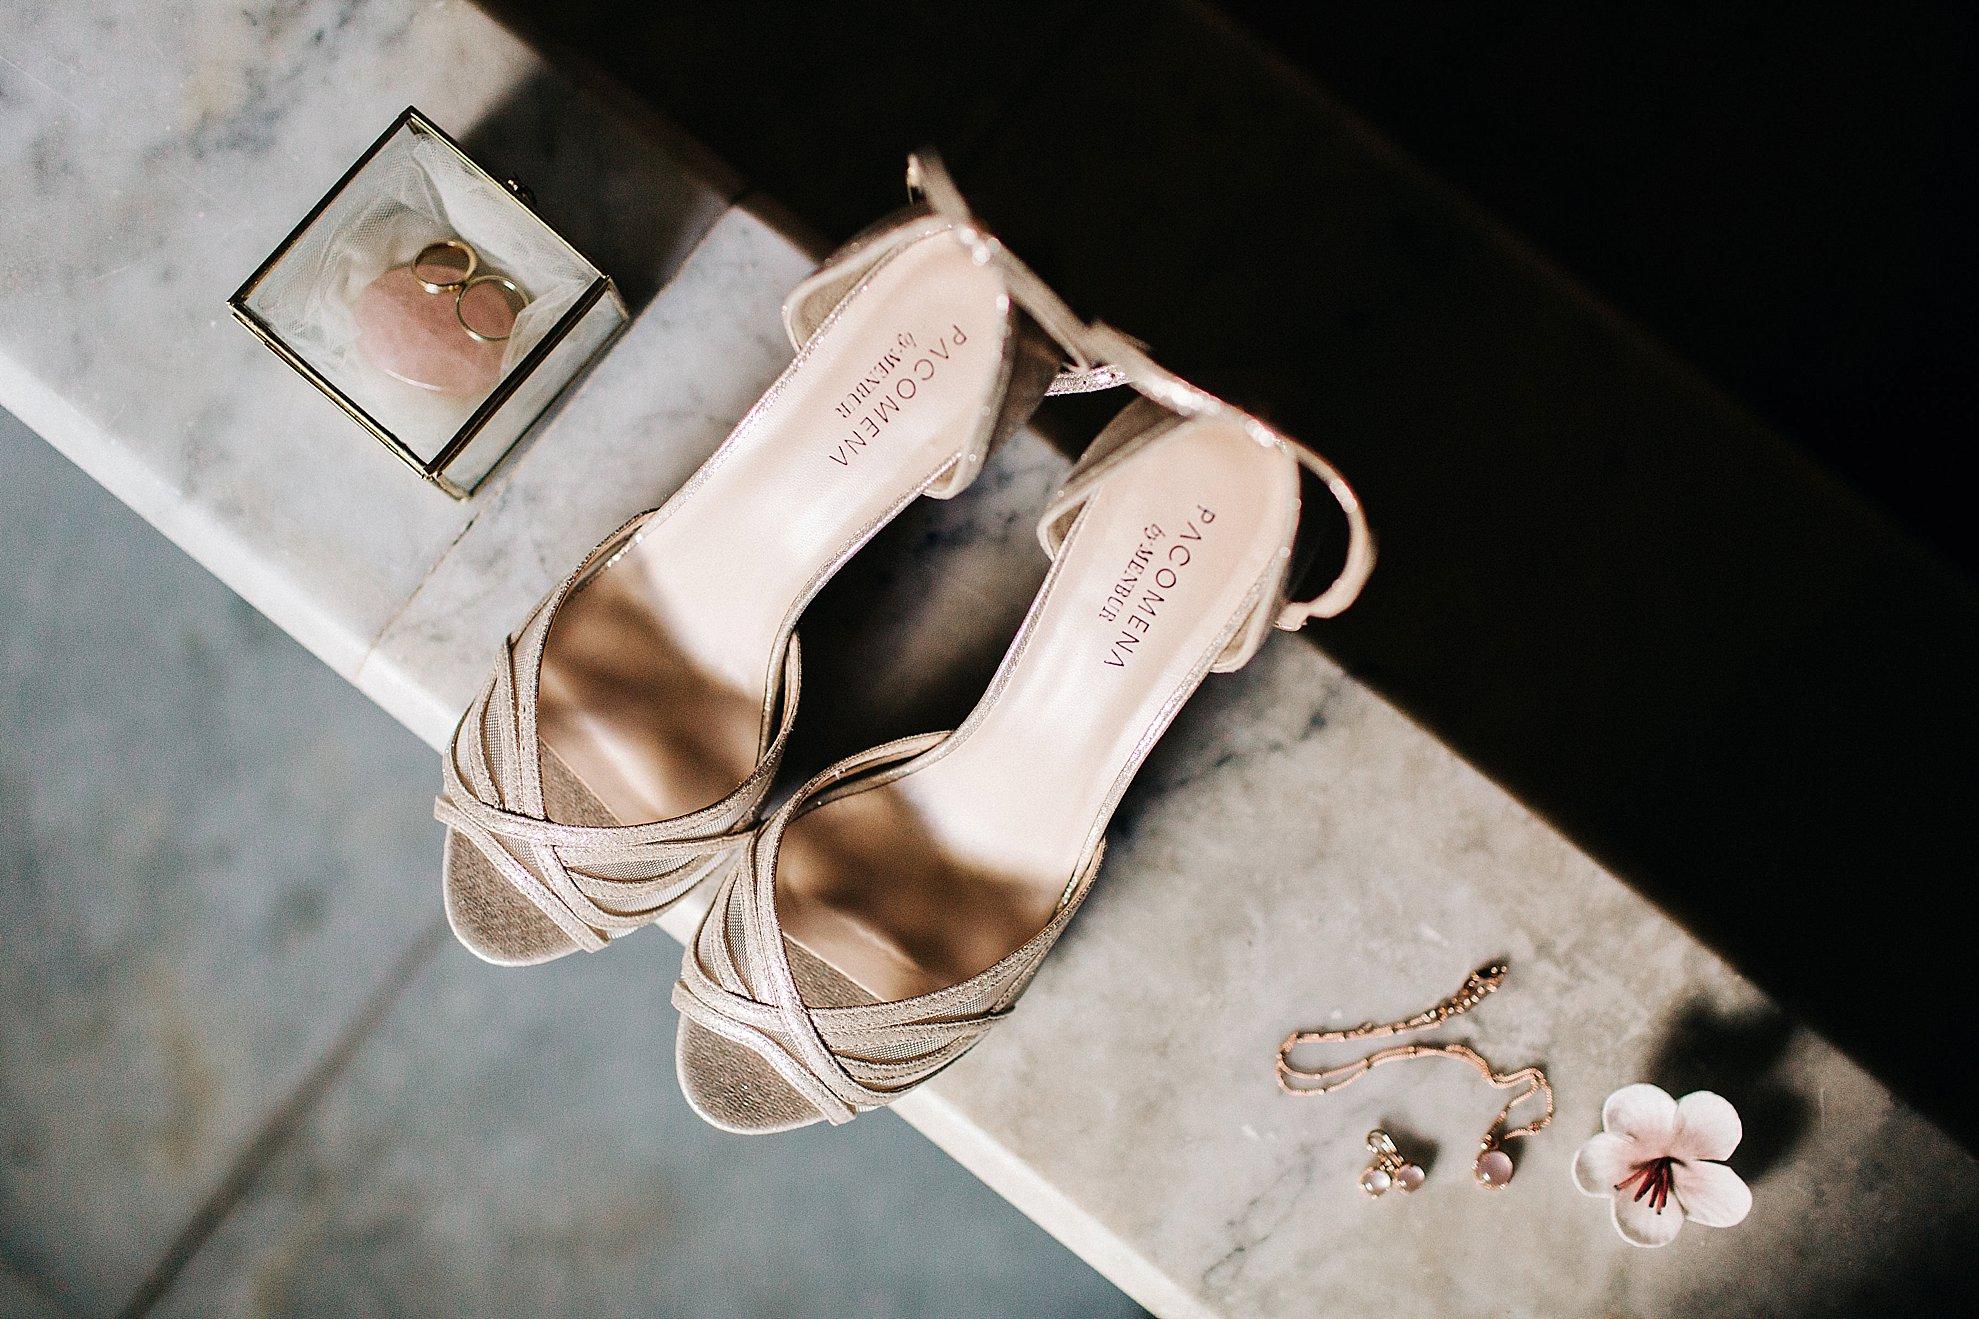 Amanda-Drost-photography-bruiloft-italie-wedding-italy-_0003.jpg